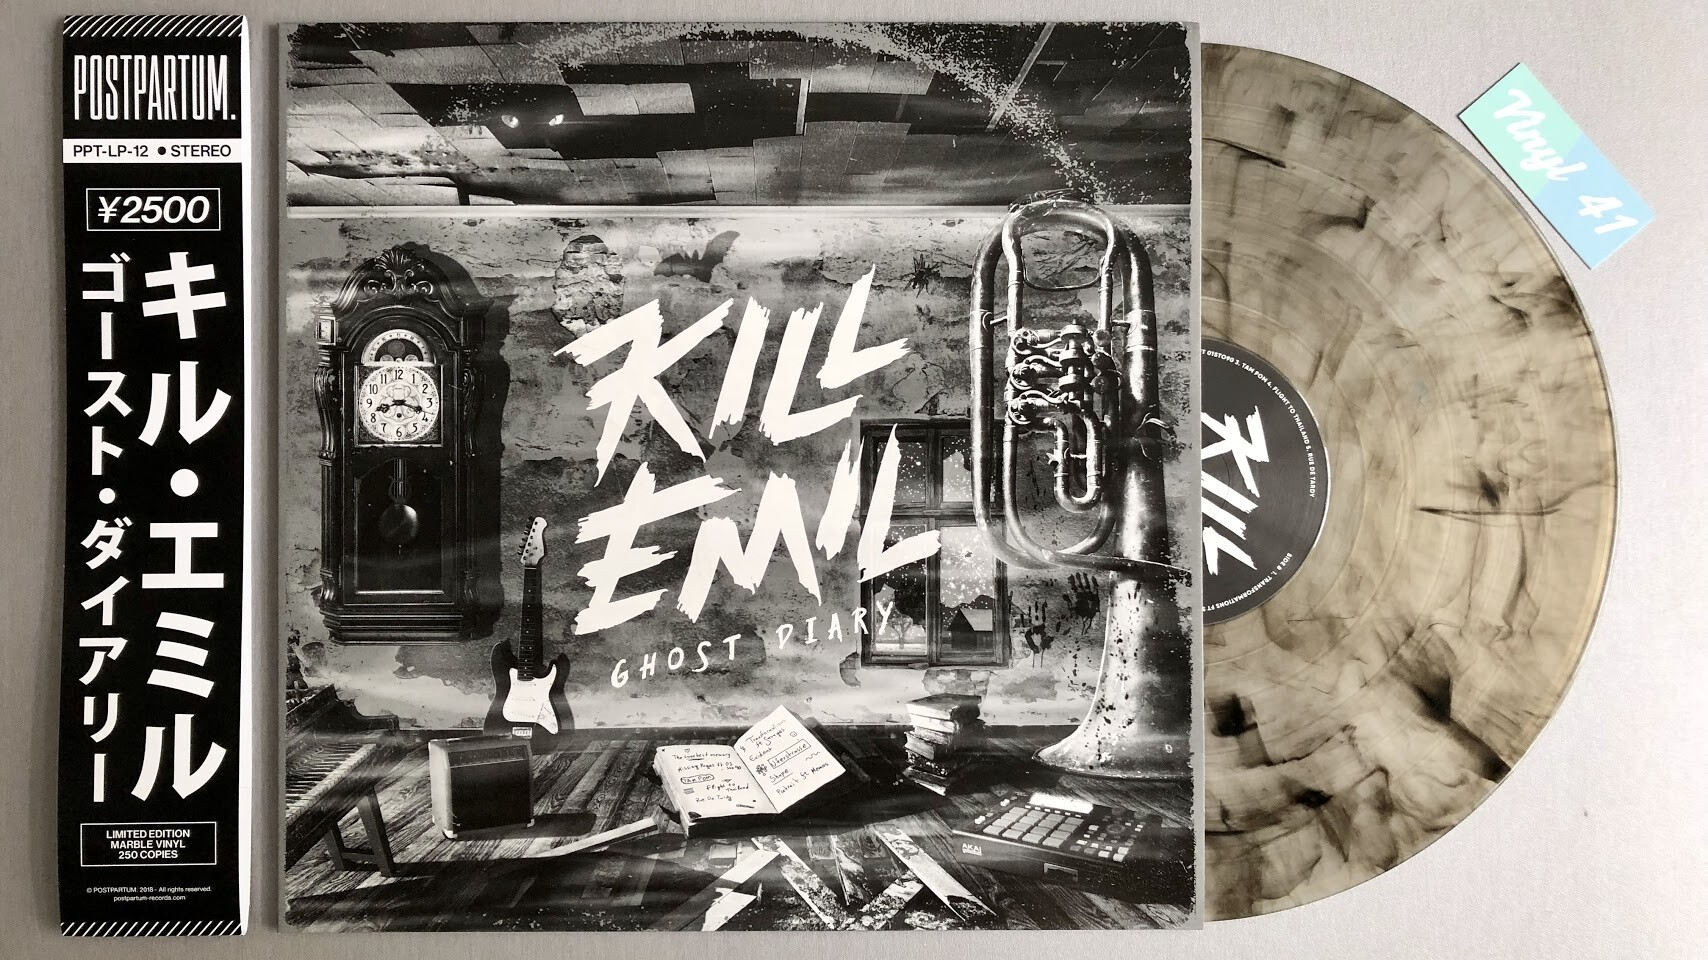 Kill Emil - Ghost Diary (POSTPARTUM.)